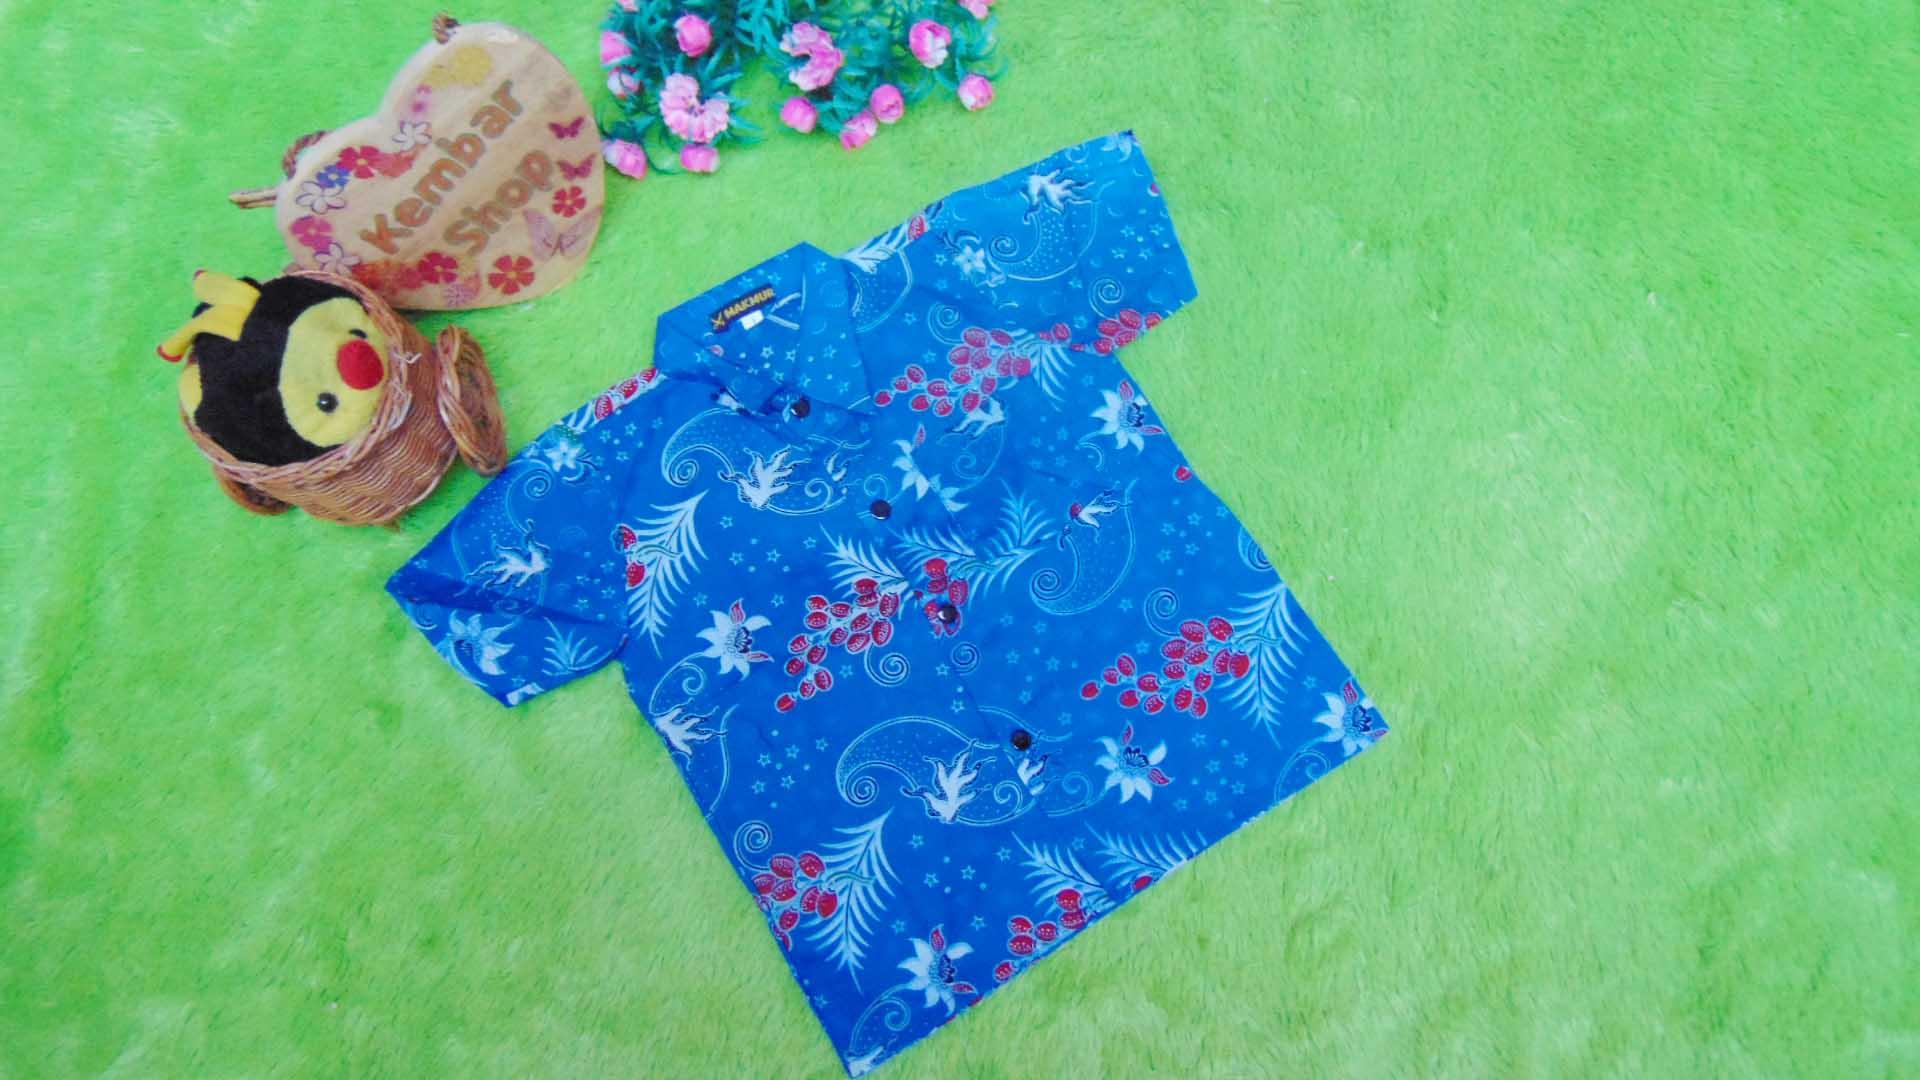 baju batik bayi anak laki-laki kemeja batik batita hem anak cowok uk 1-3th baju pesta motif mlinjo